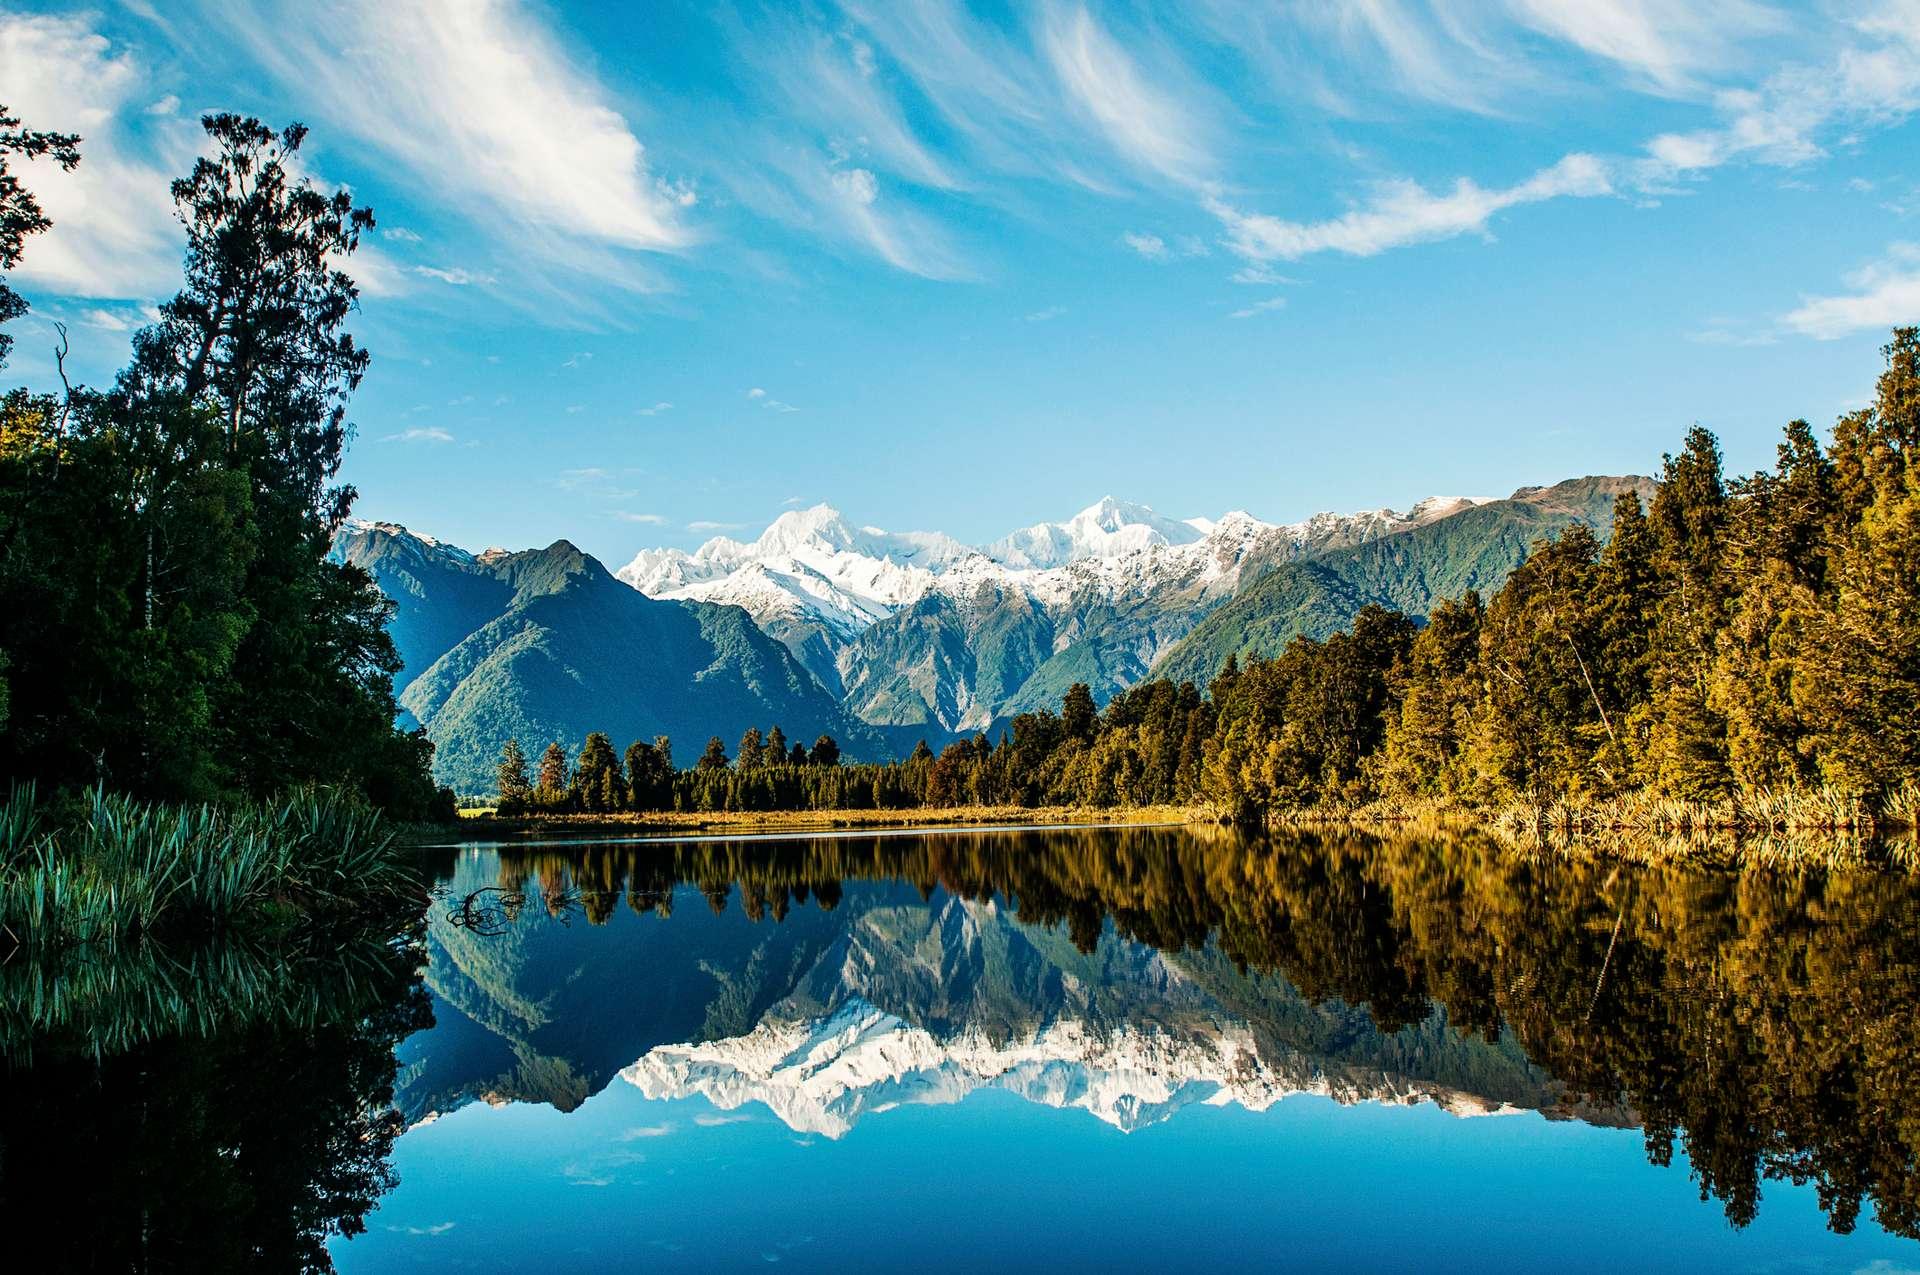 Nieuw Zeeland Mount Cook Mount Tasman Lake Matheson